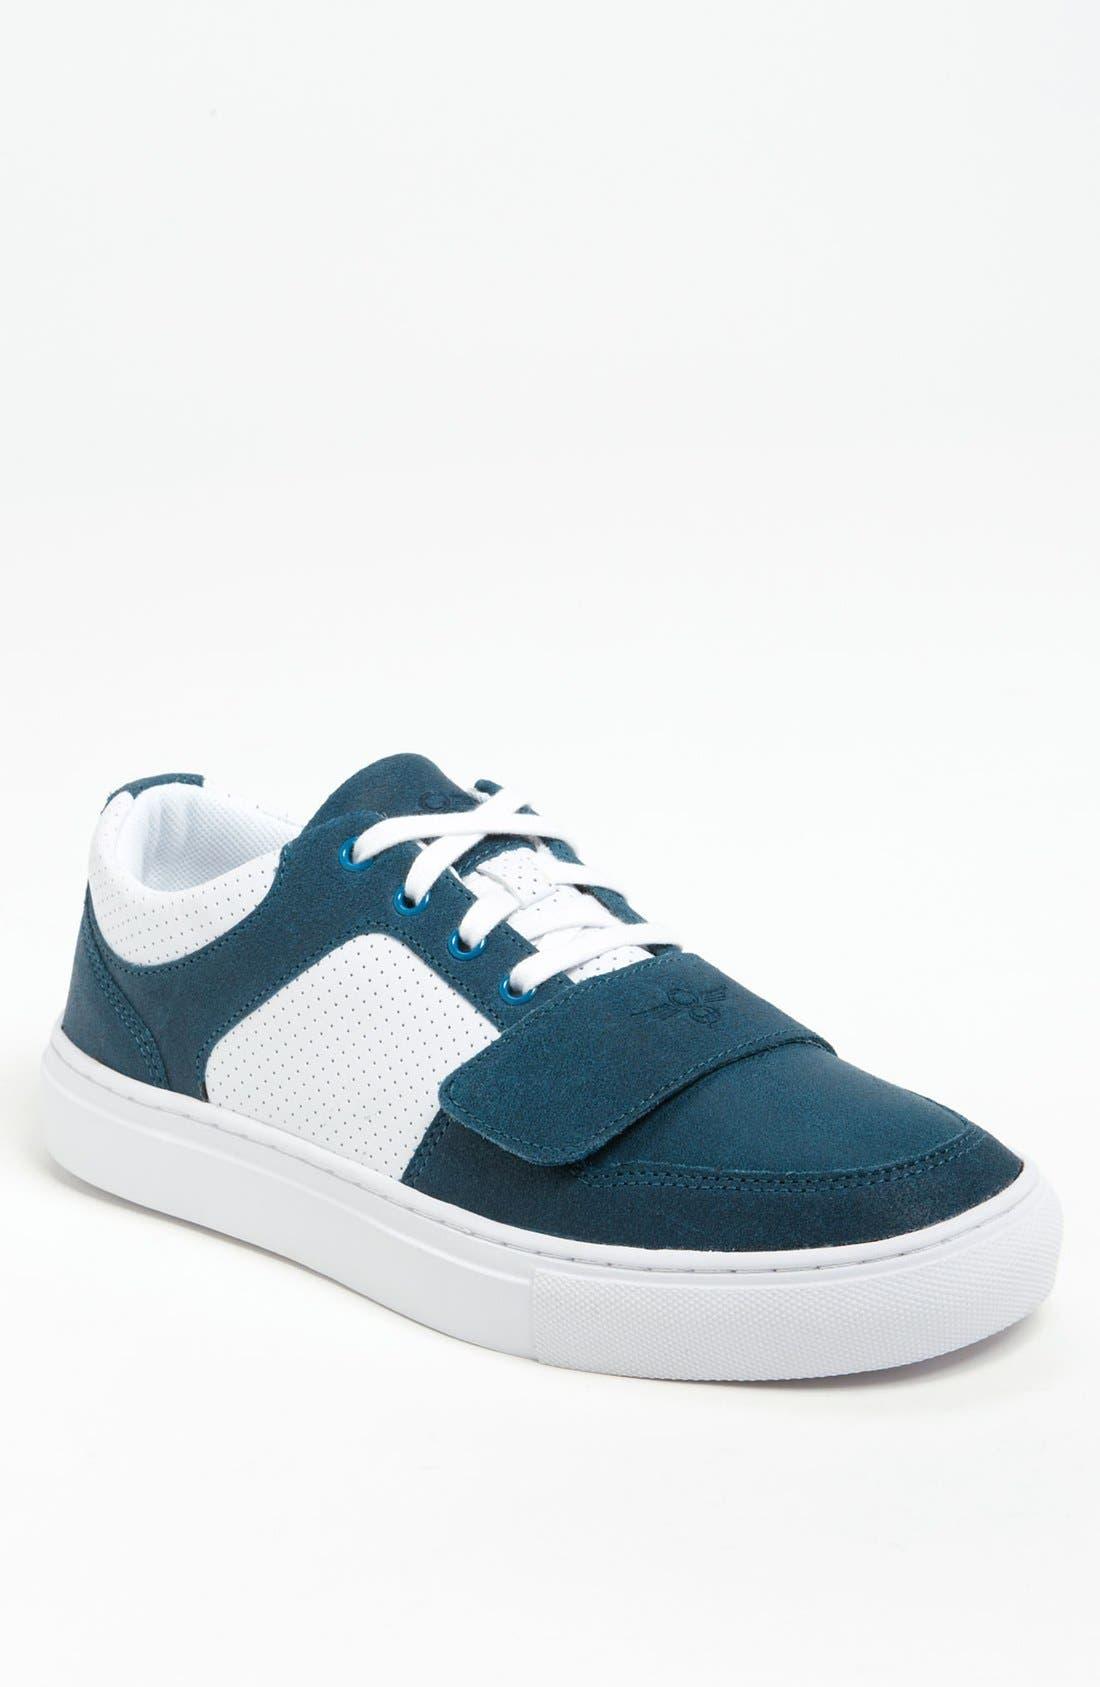 Main Image - Creative Recreation 'Cesario Lo X' Sneaker (Men)